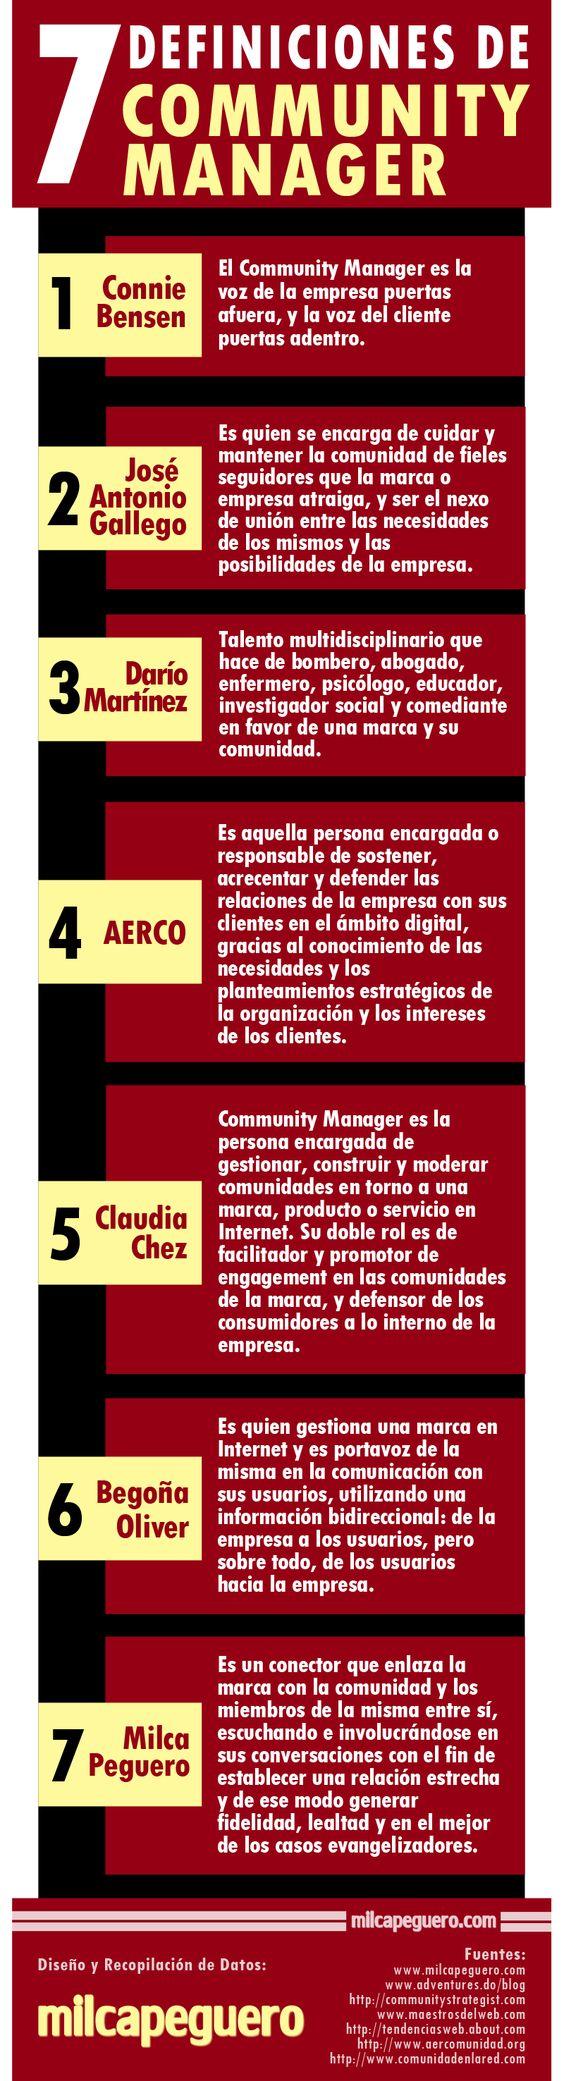 7 definiciones del Community Manager #infografia